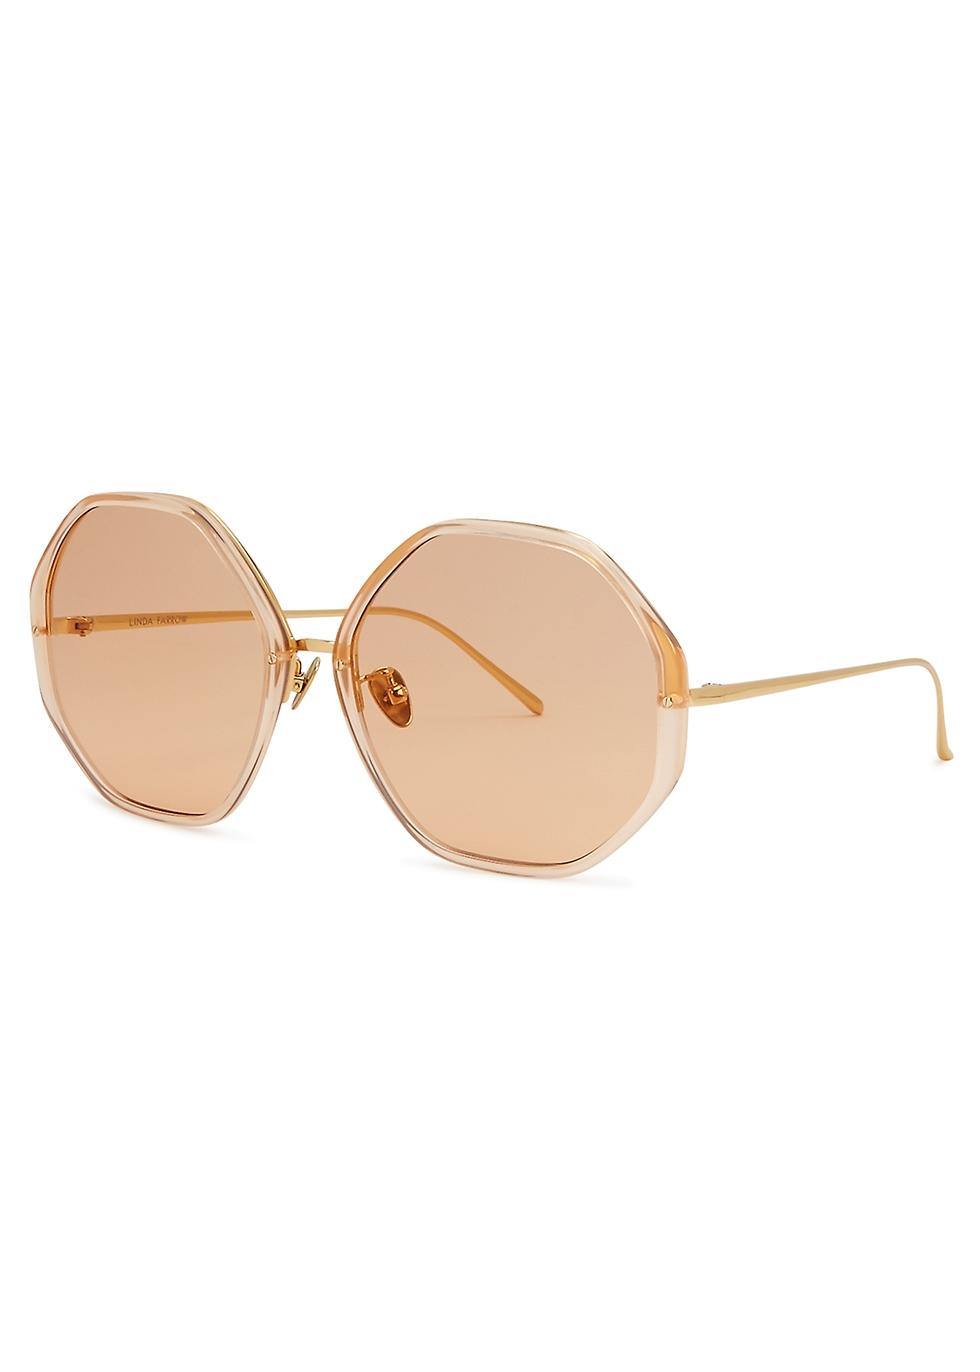 LINDA FARROW LUXE 901 Oversized Sunglasses in Pink